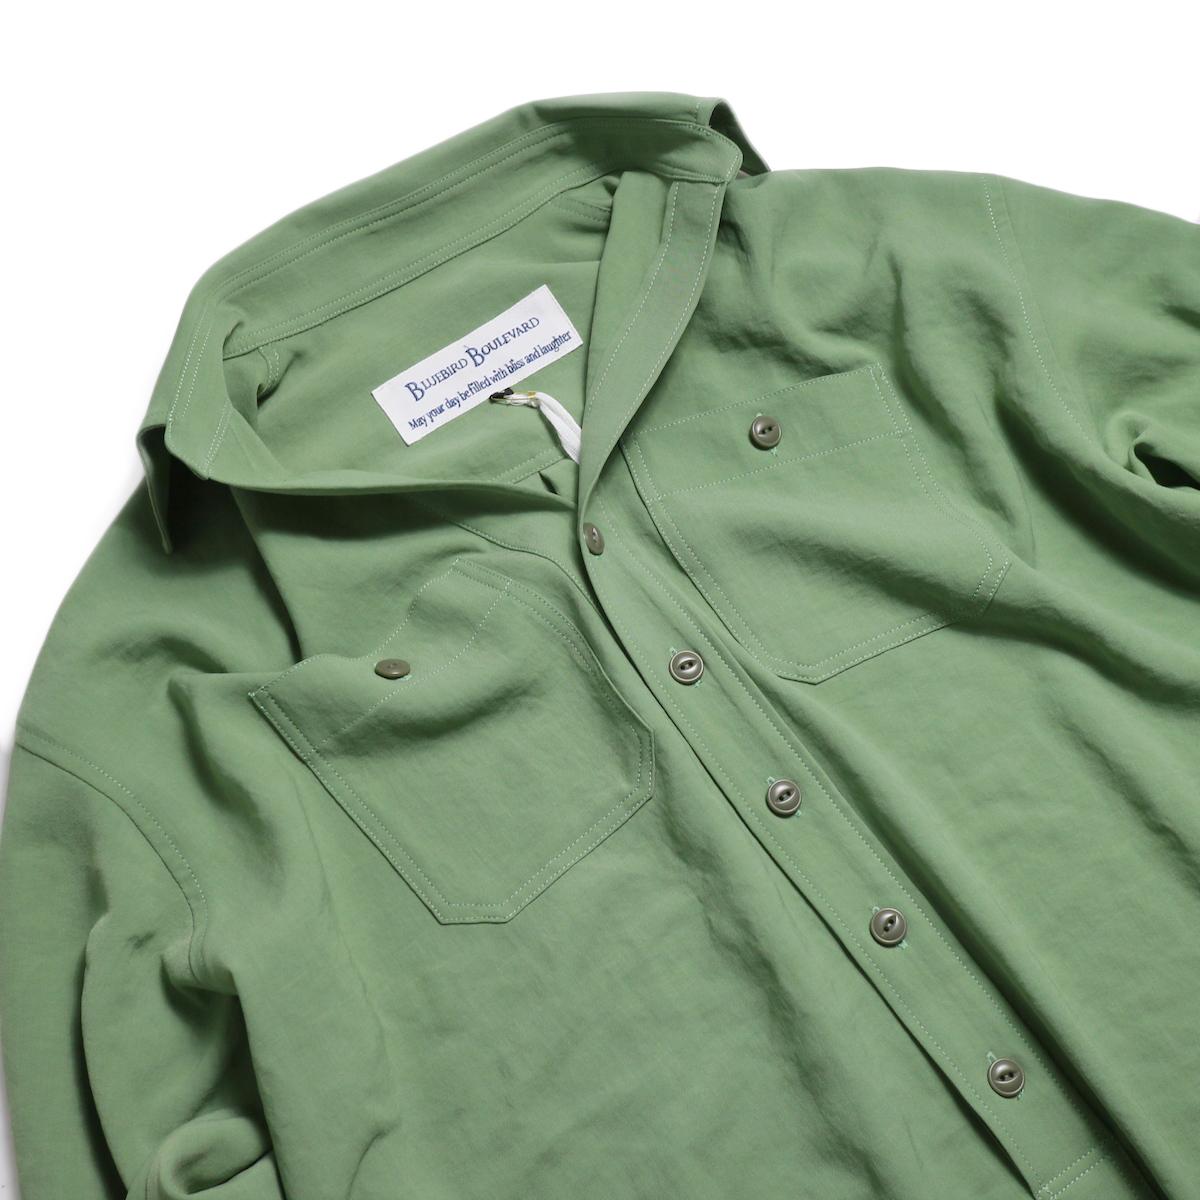 BLUEBIRD BOULEVARD / ワッシャーツイルシャツドレス -Green 襟